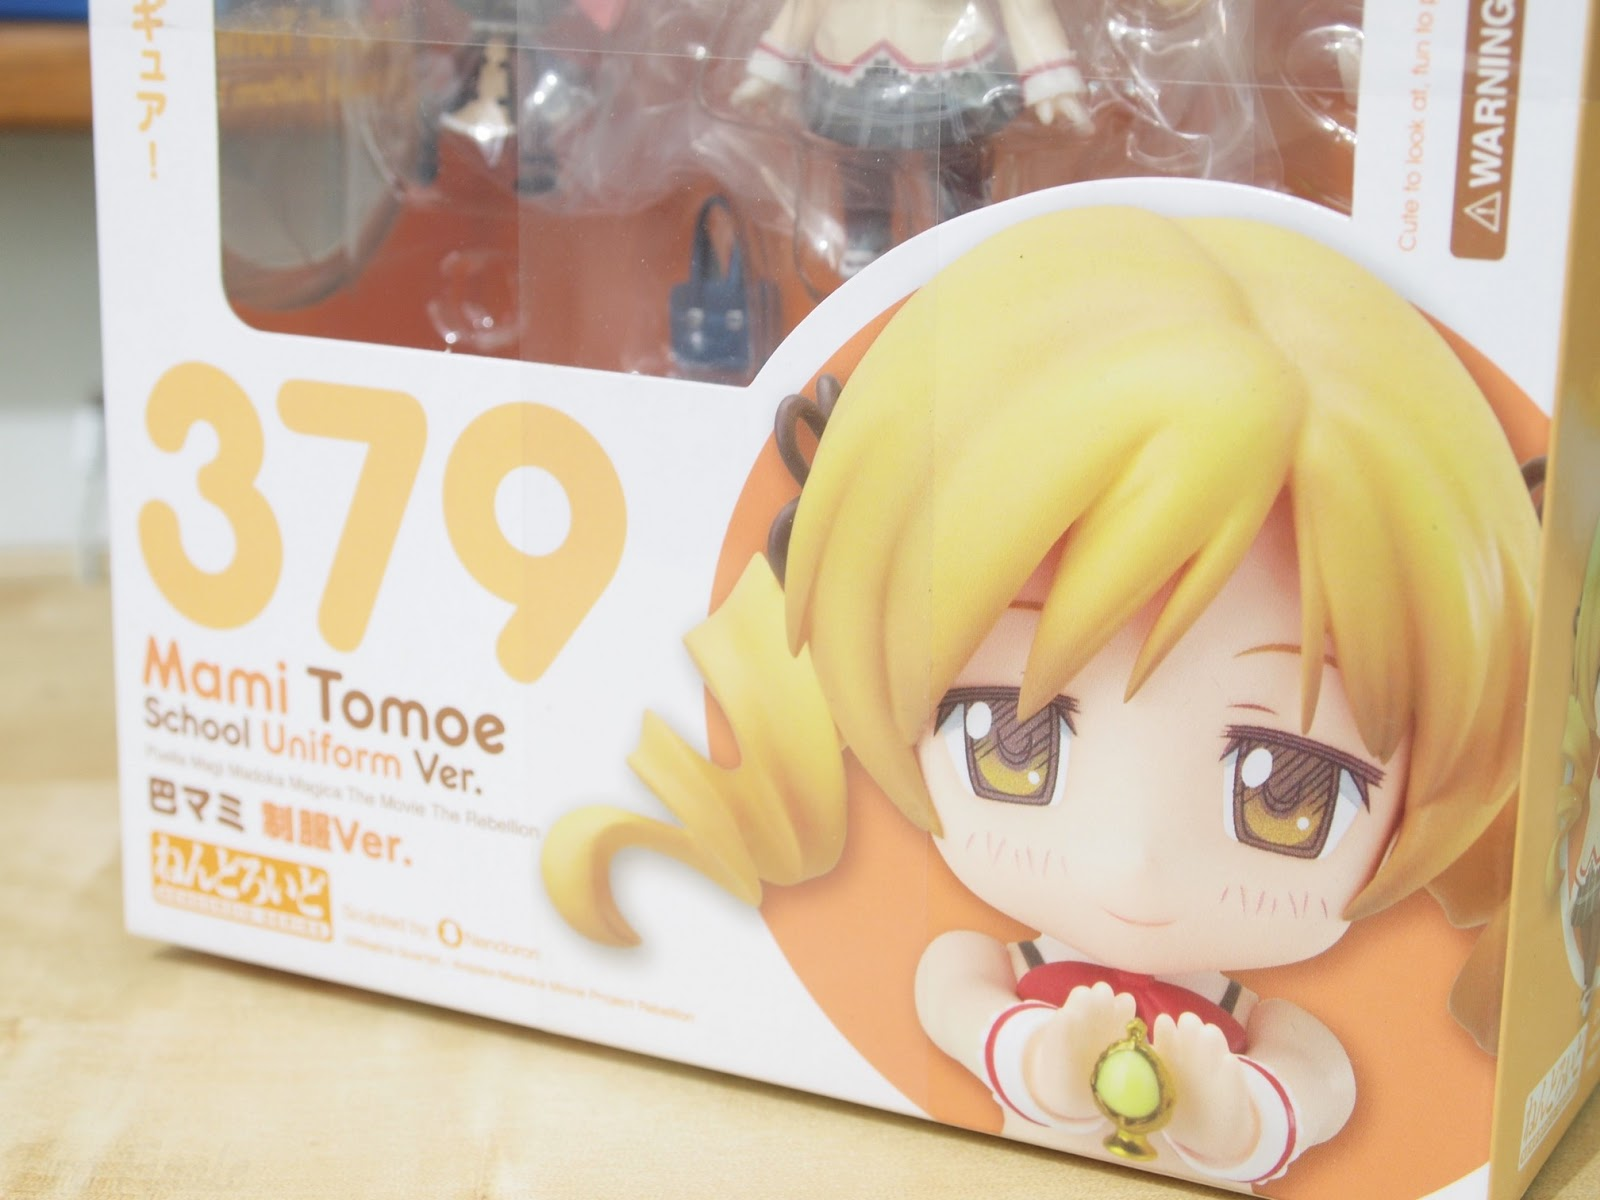 Nendoroid 379. Mami Tomoe: School Uniform Ver. Puella Magi Madoka Magica / Девочка-волшебница Мадока Мами Томоэ